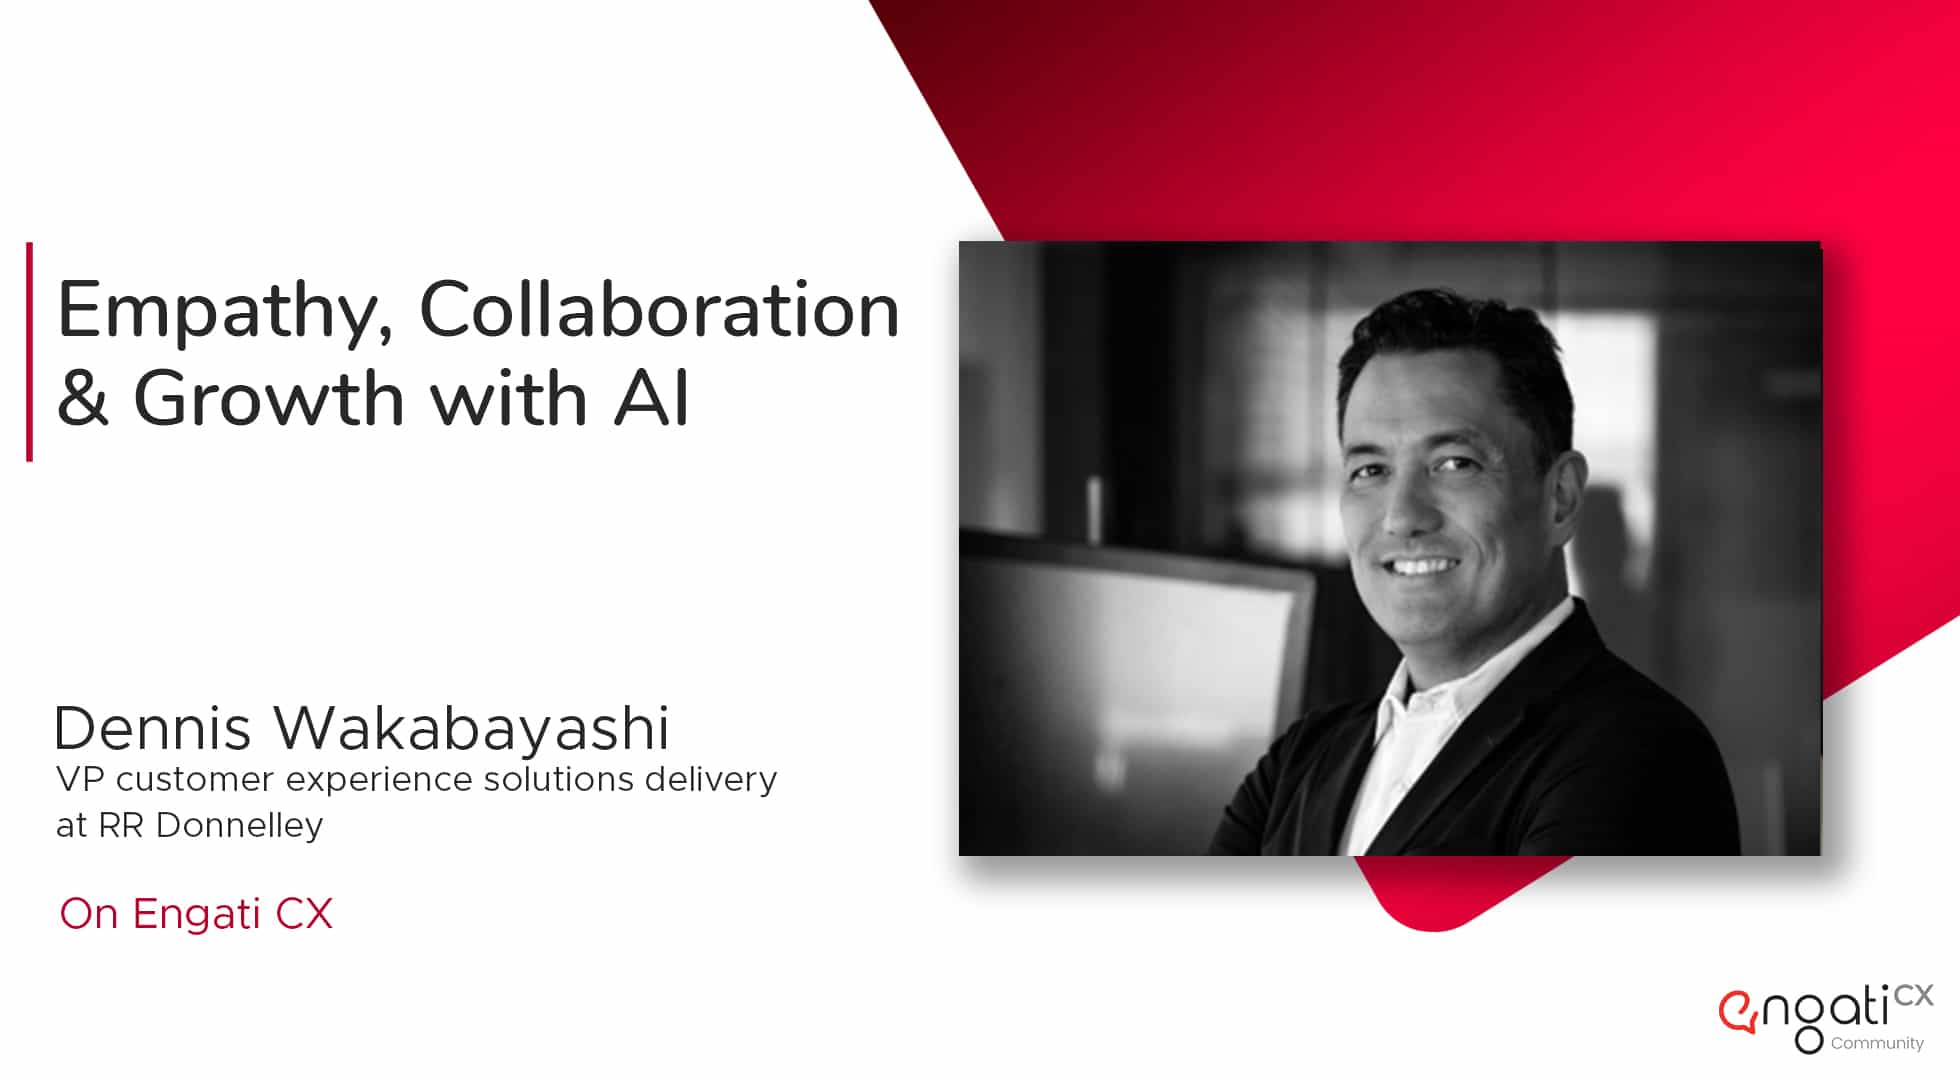 Empathy, collaboration & growth with AI | Dennis Wakabayashi | Engati CX